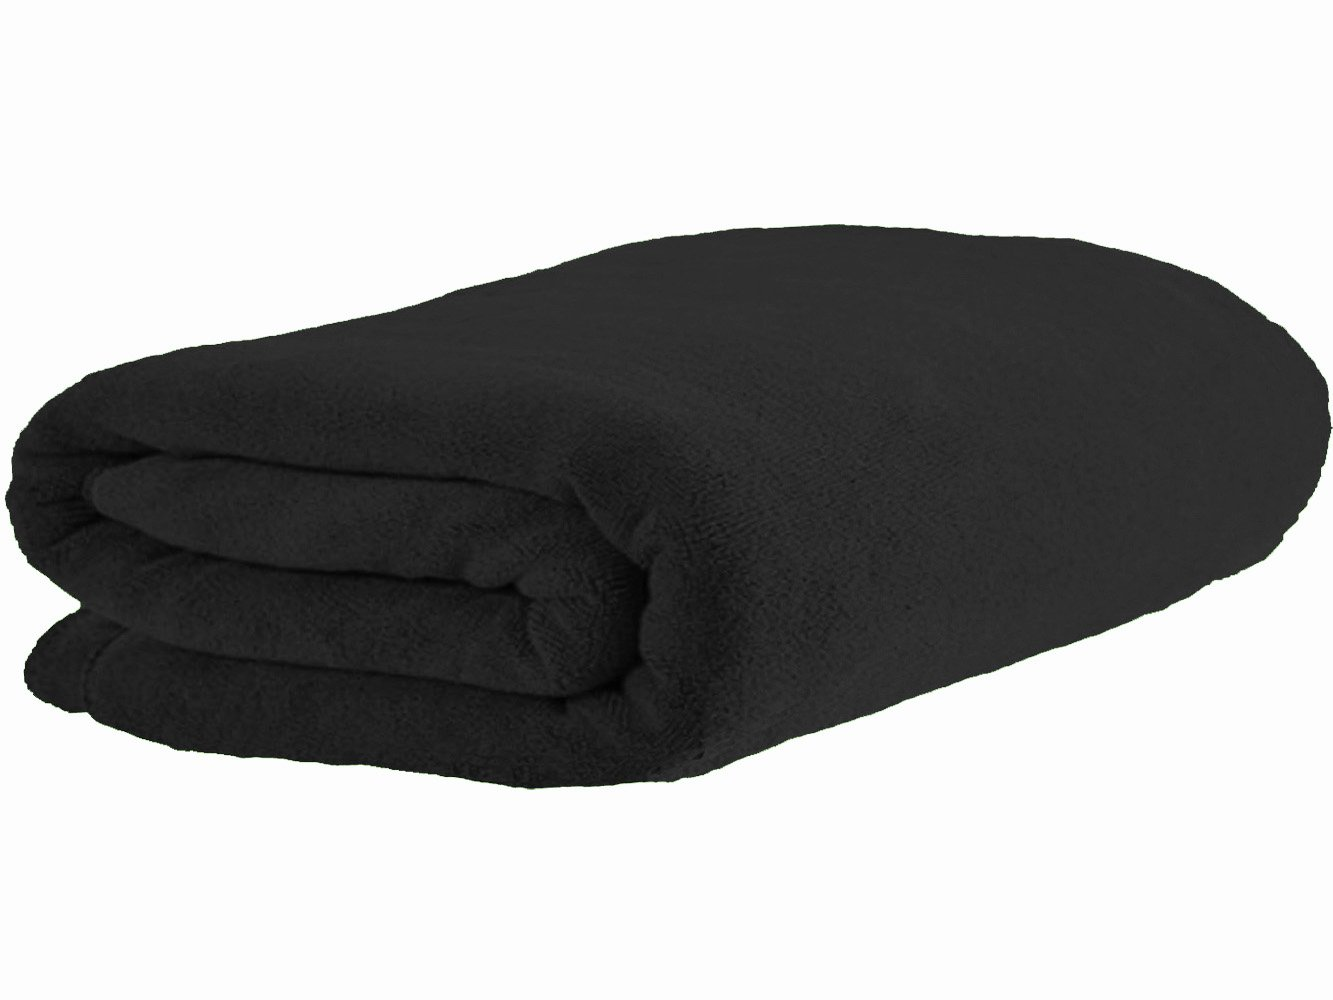 Simplife Luxury Microfiber Extra Large Bath Towel Beach Bath Sheet Fast Drying Towel Soft Absorbent Towel(36 Inch X 72 Inch, Black)